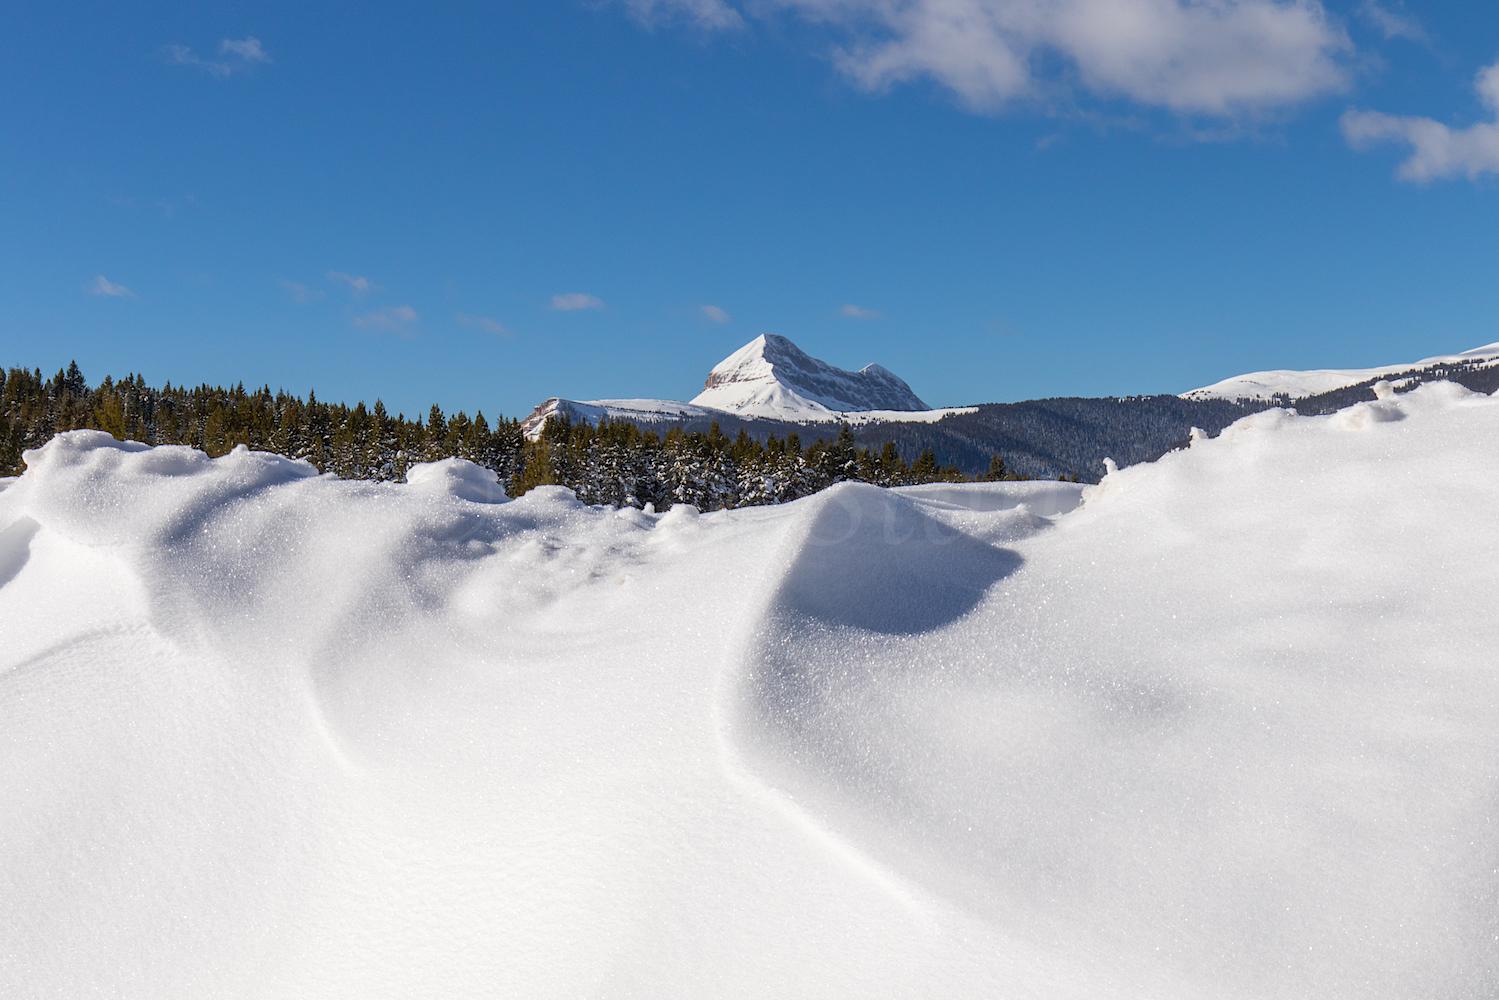 Engineer Mountain, Image # 1315